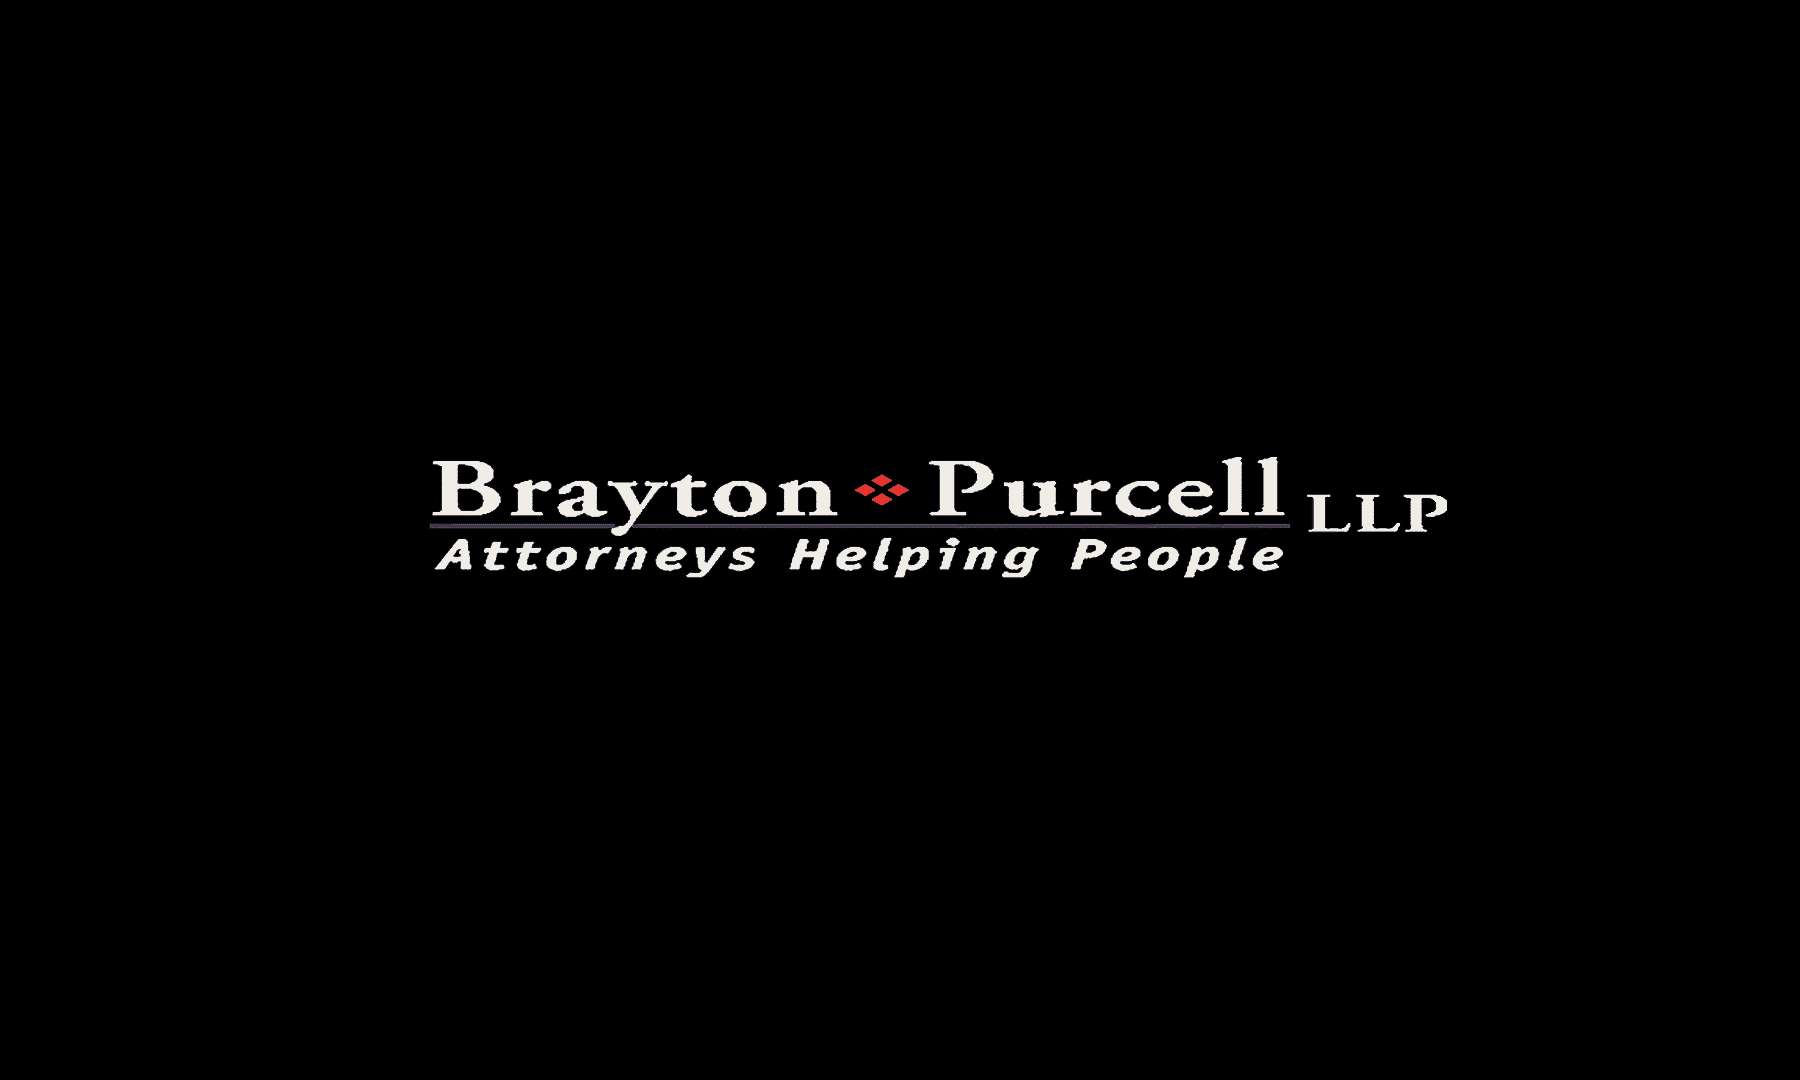 Brayton Purcell